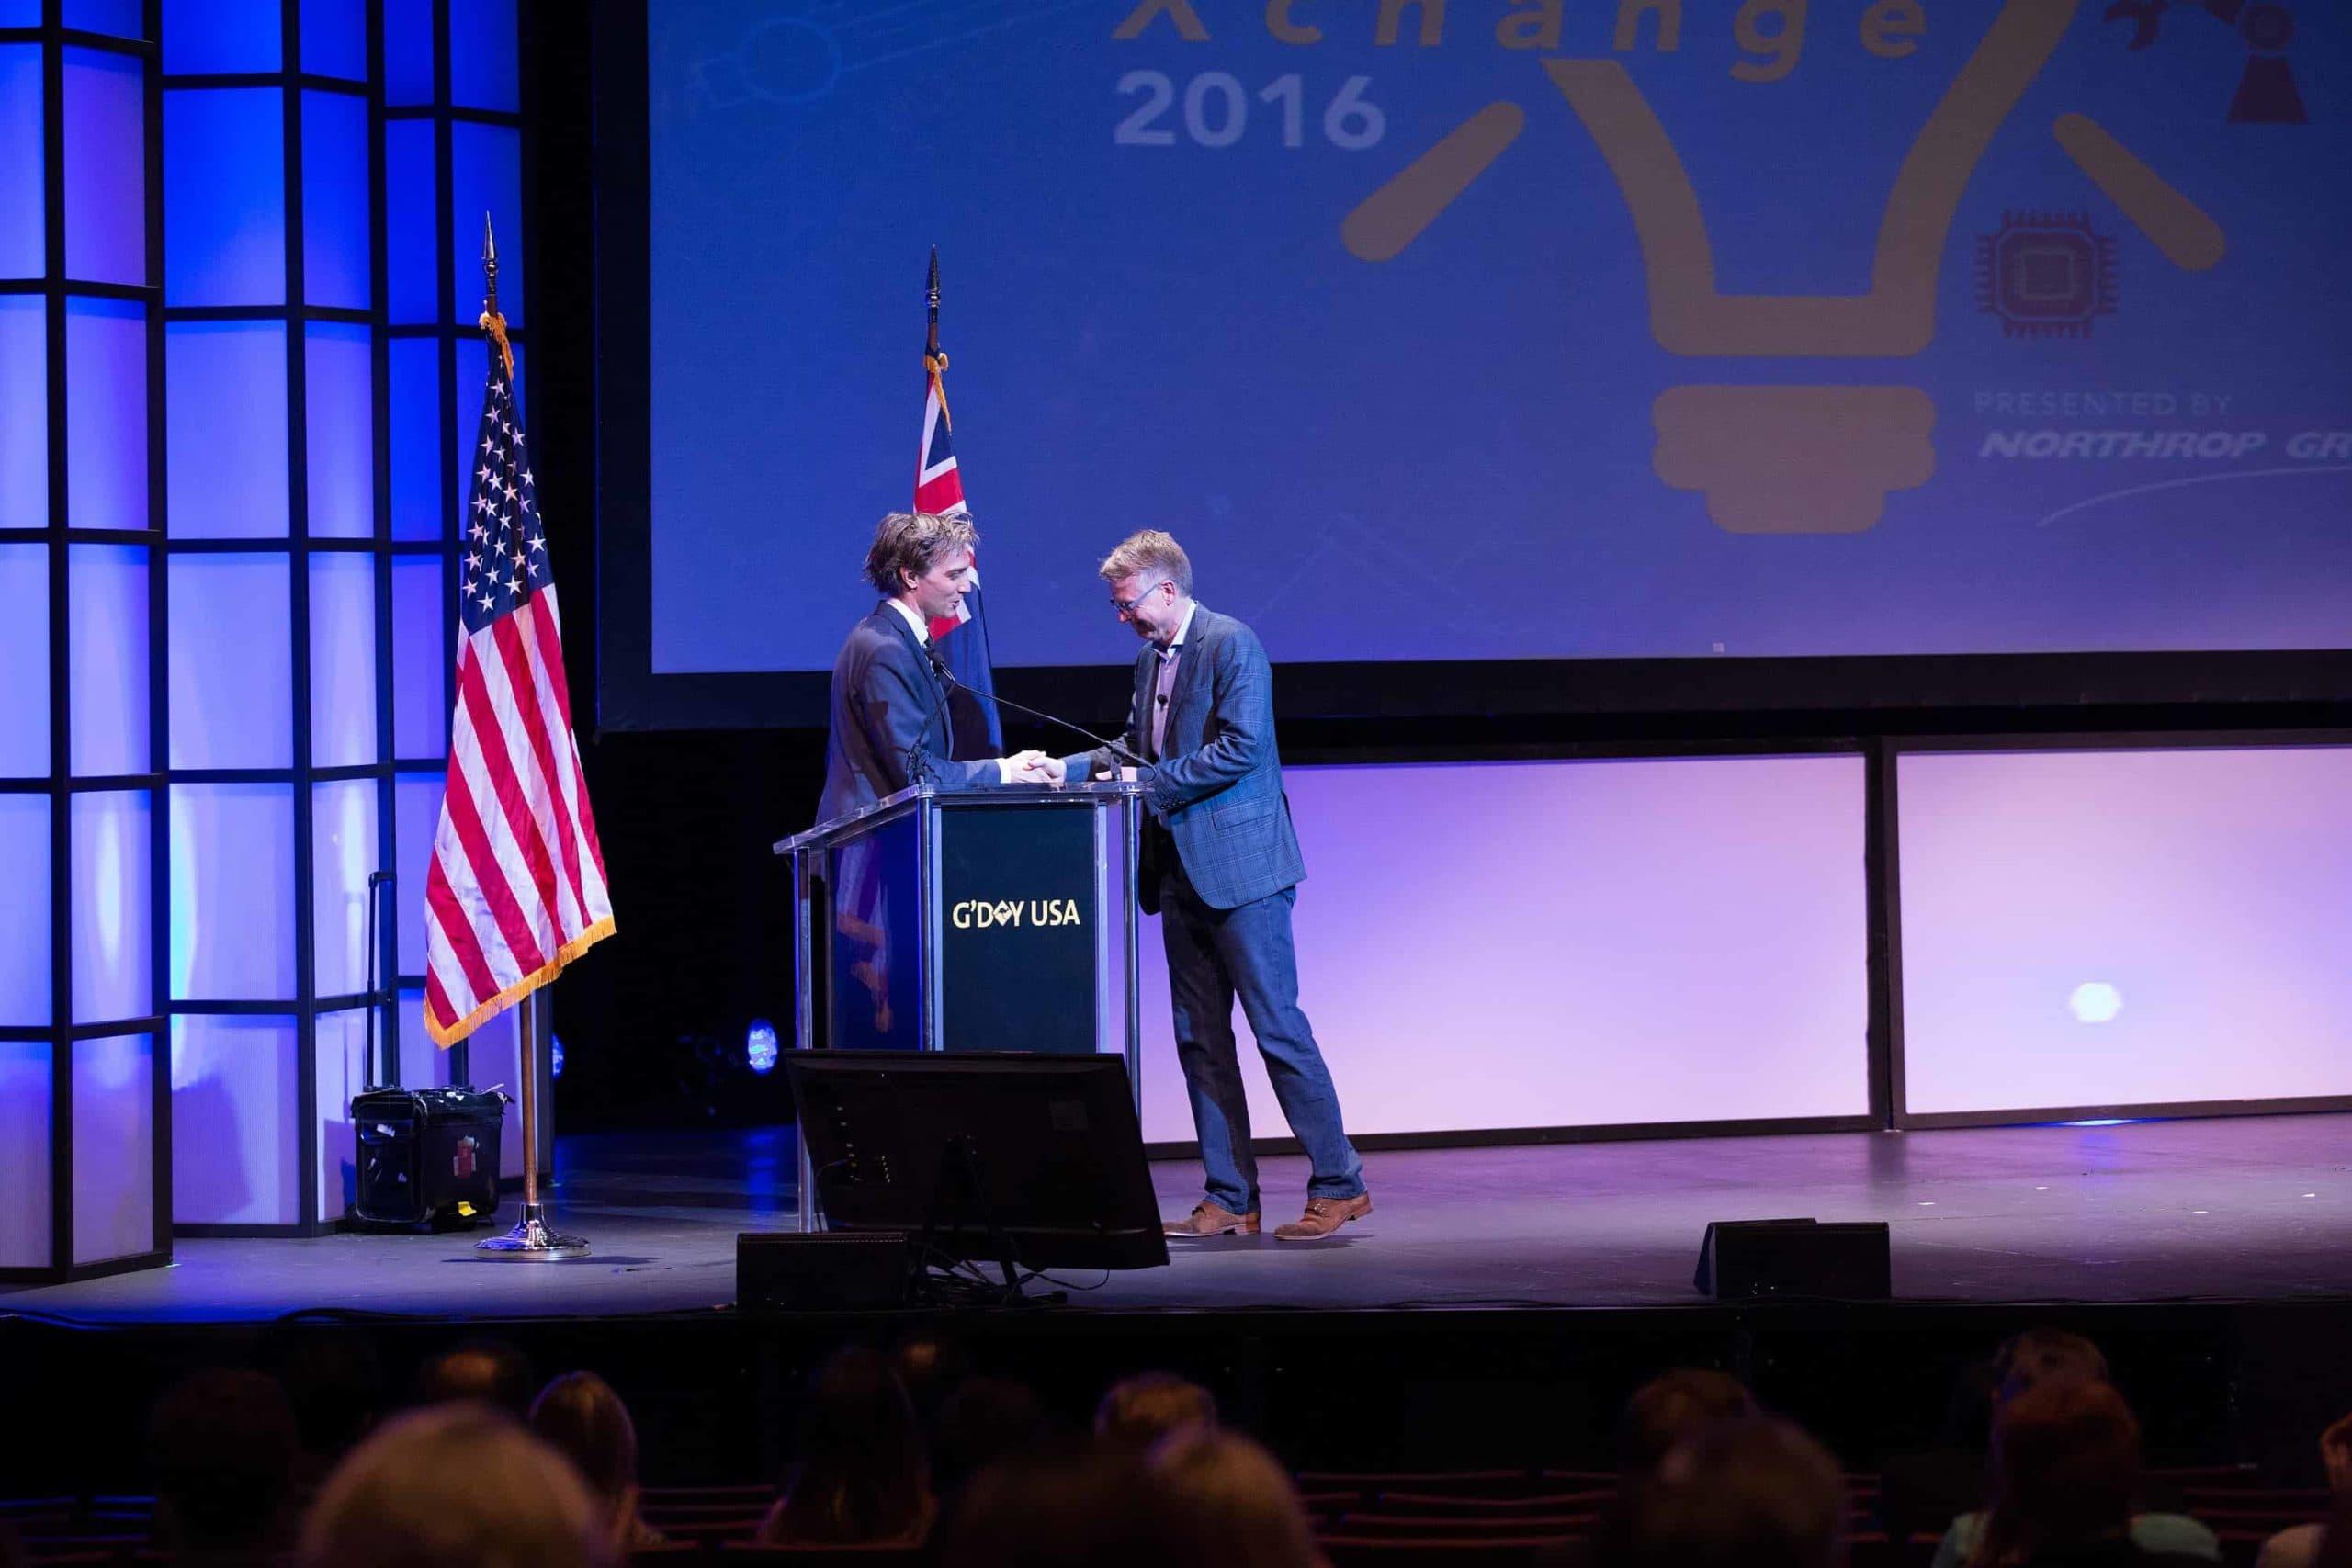 Innovators Xchange 2016 G'Day USA